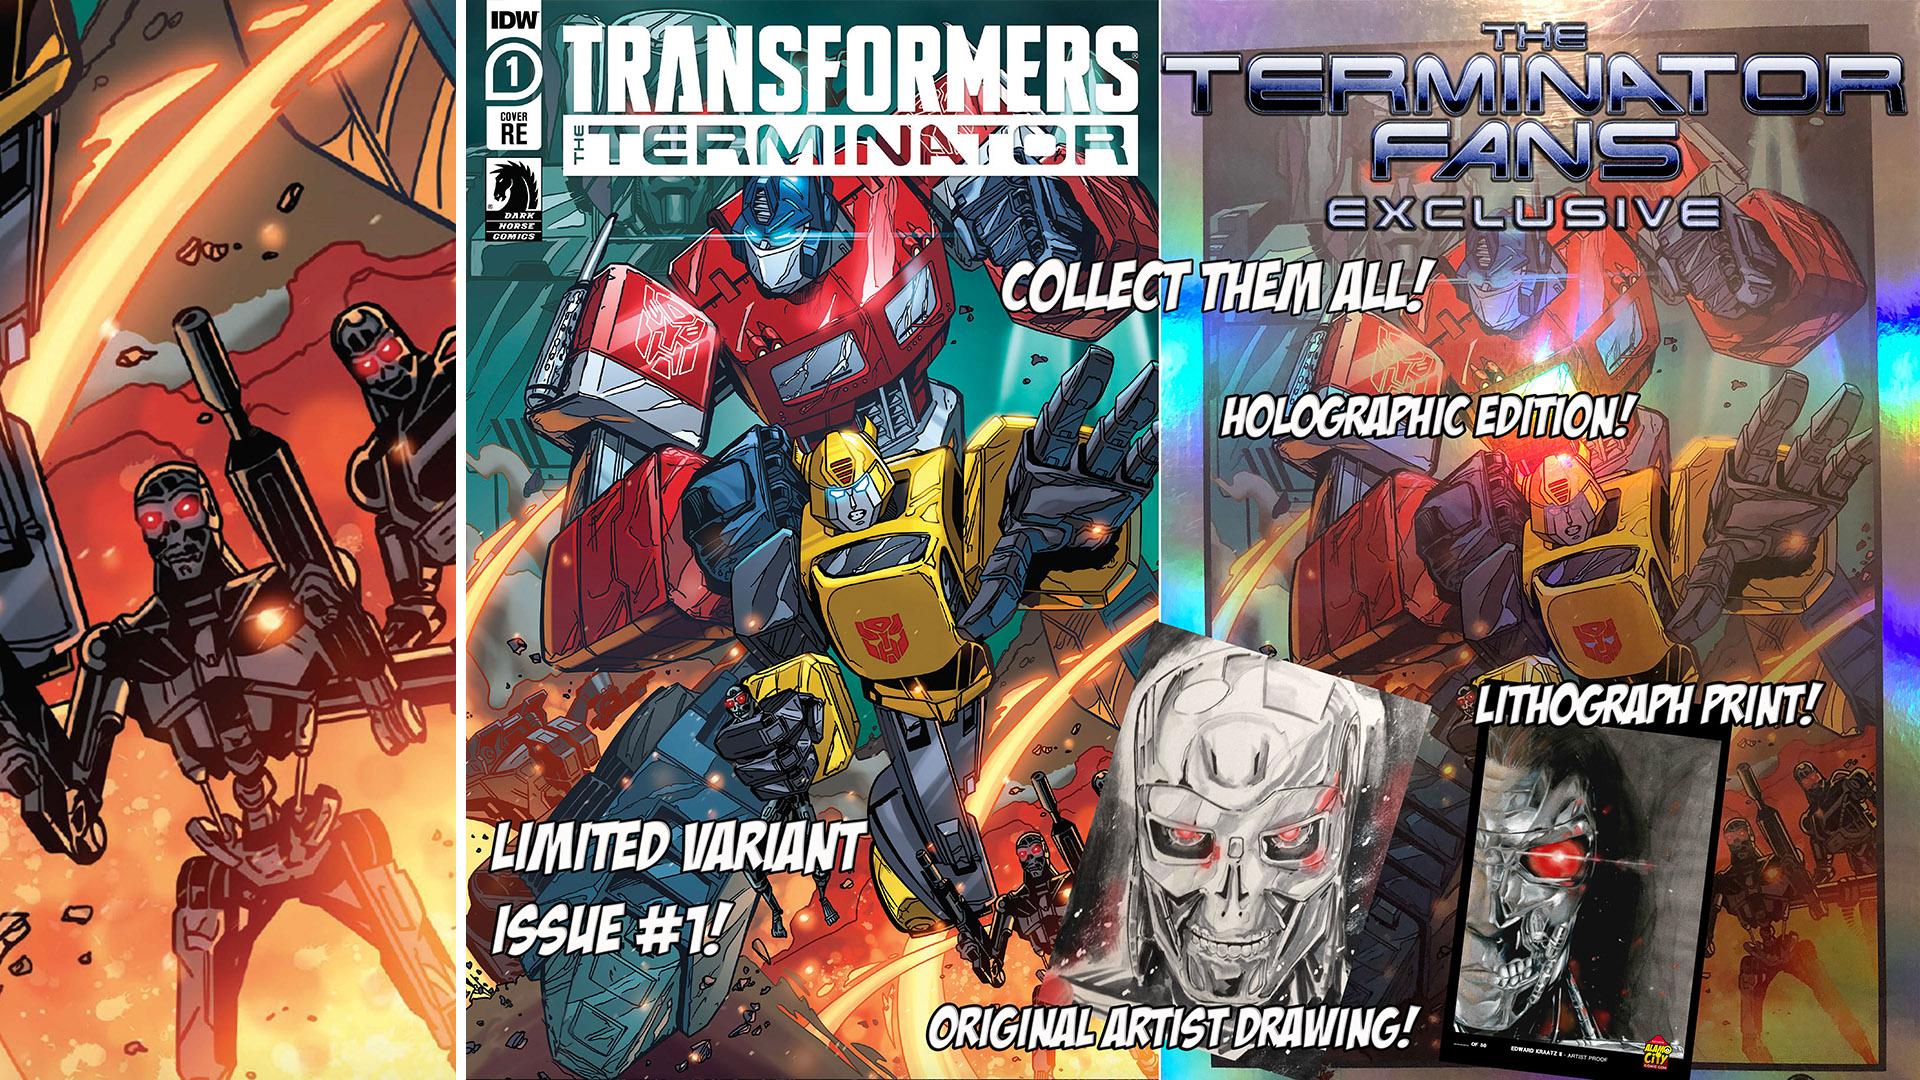 Transformers vs The Terminator Edward Kraatz II Collectors Group Package